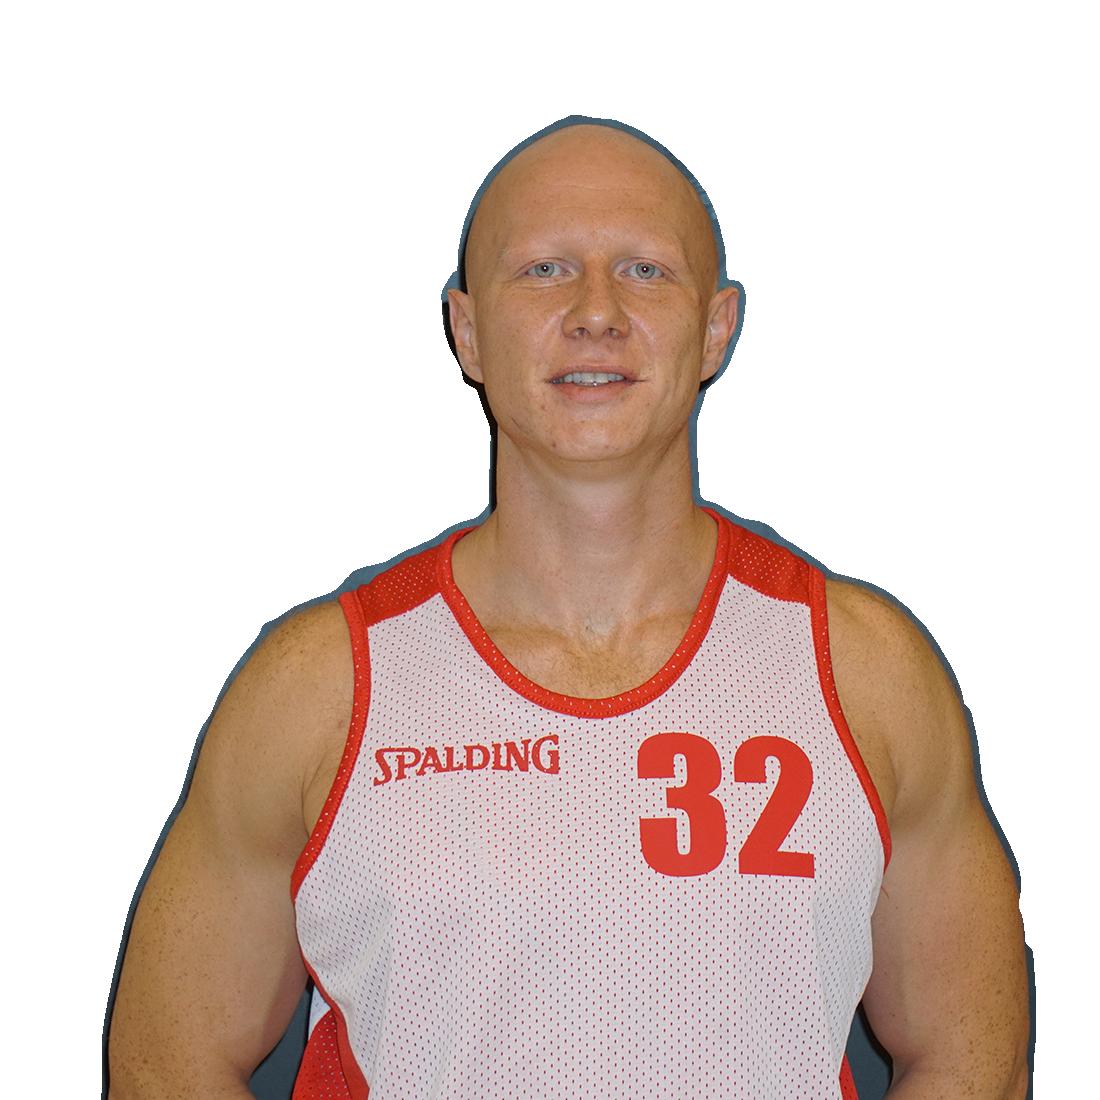 Kamil Skonieczka